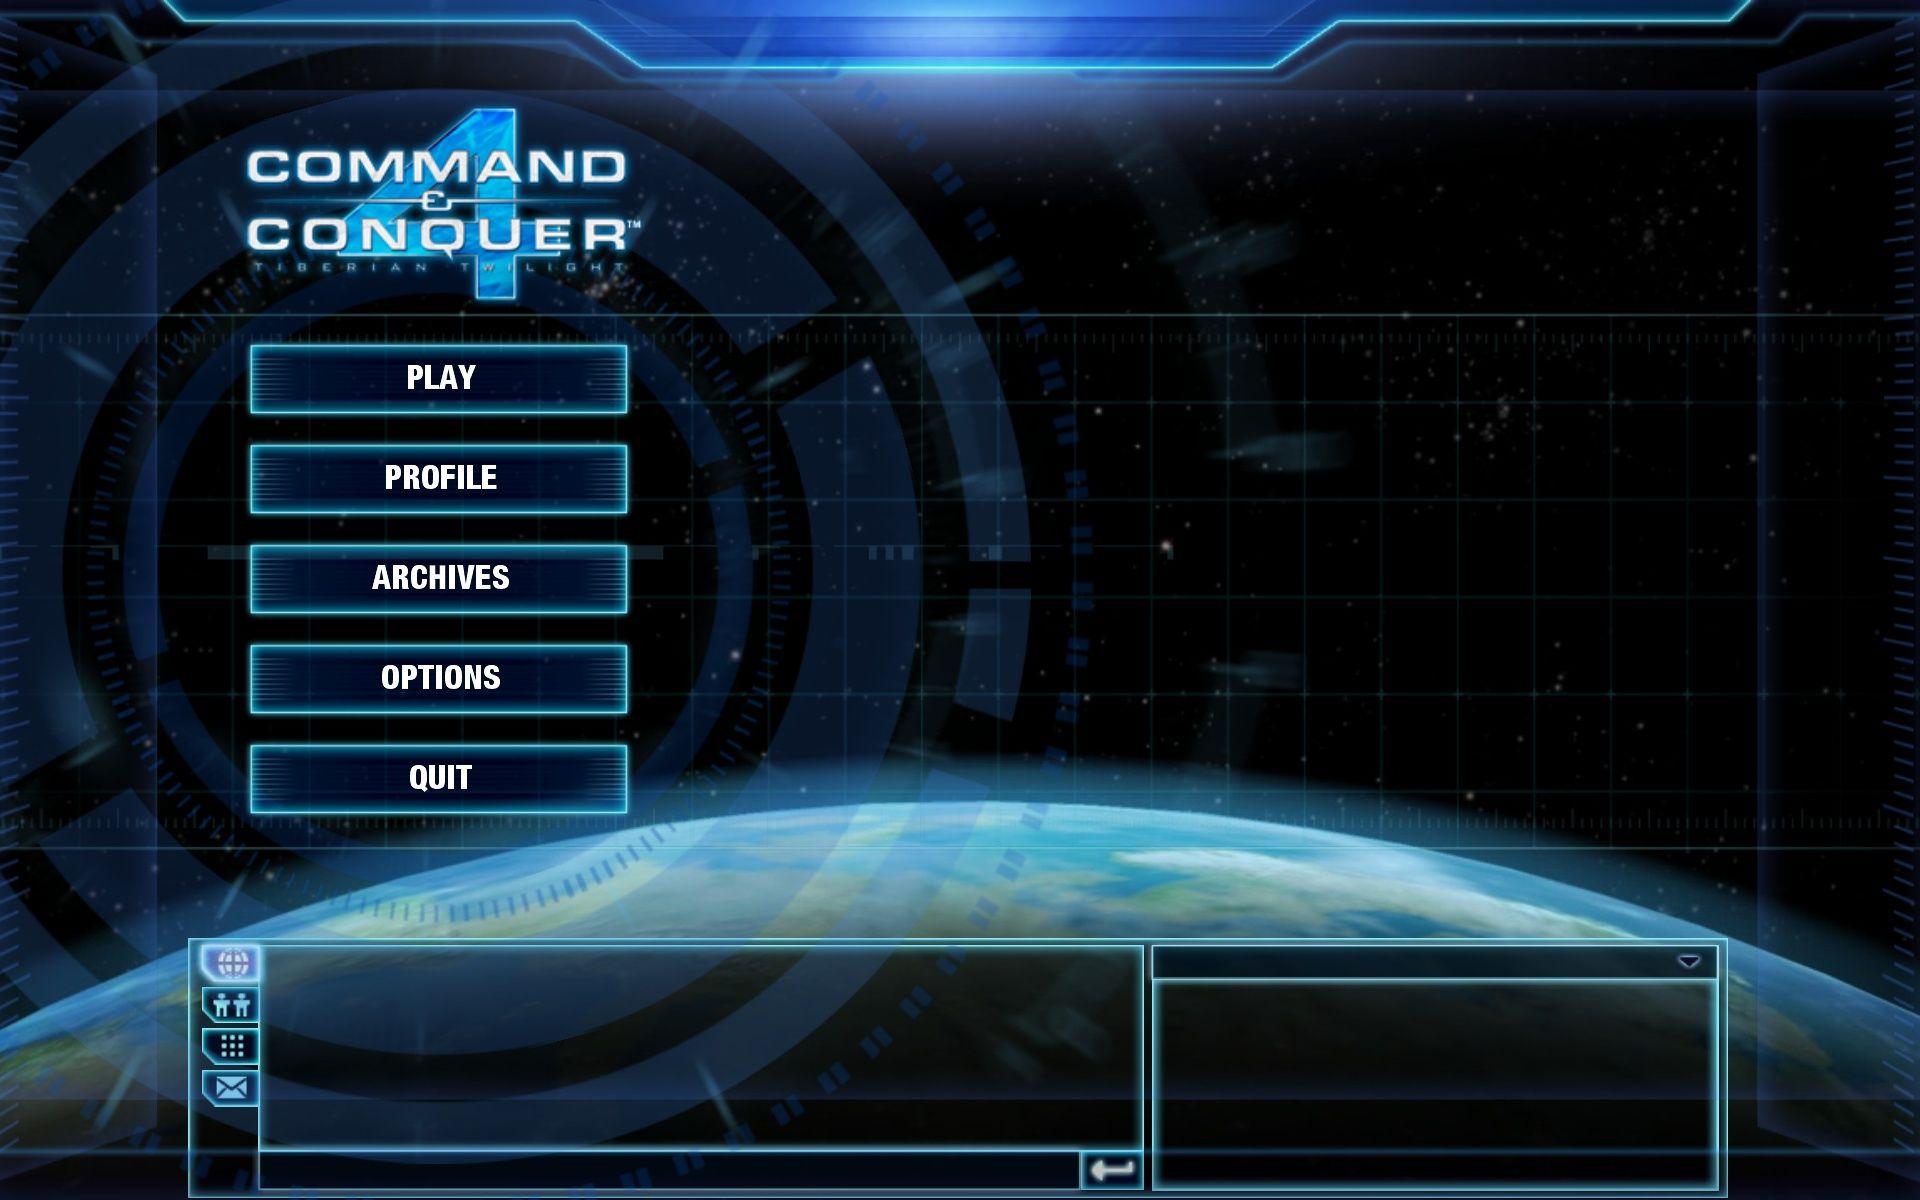 Command & Conquer 4: Tiberian Twilight Details - LaunchBox